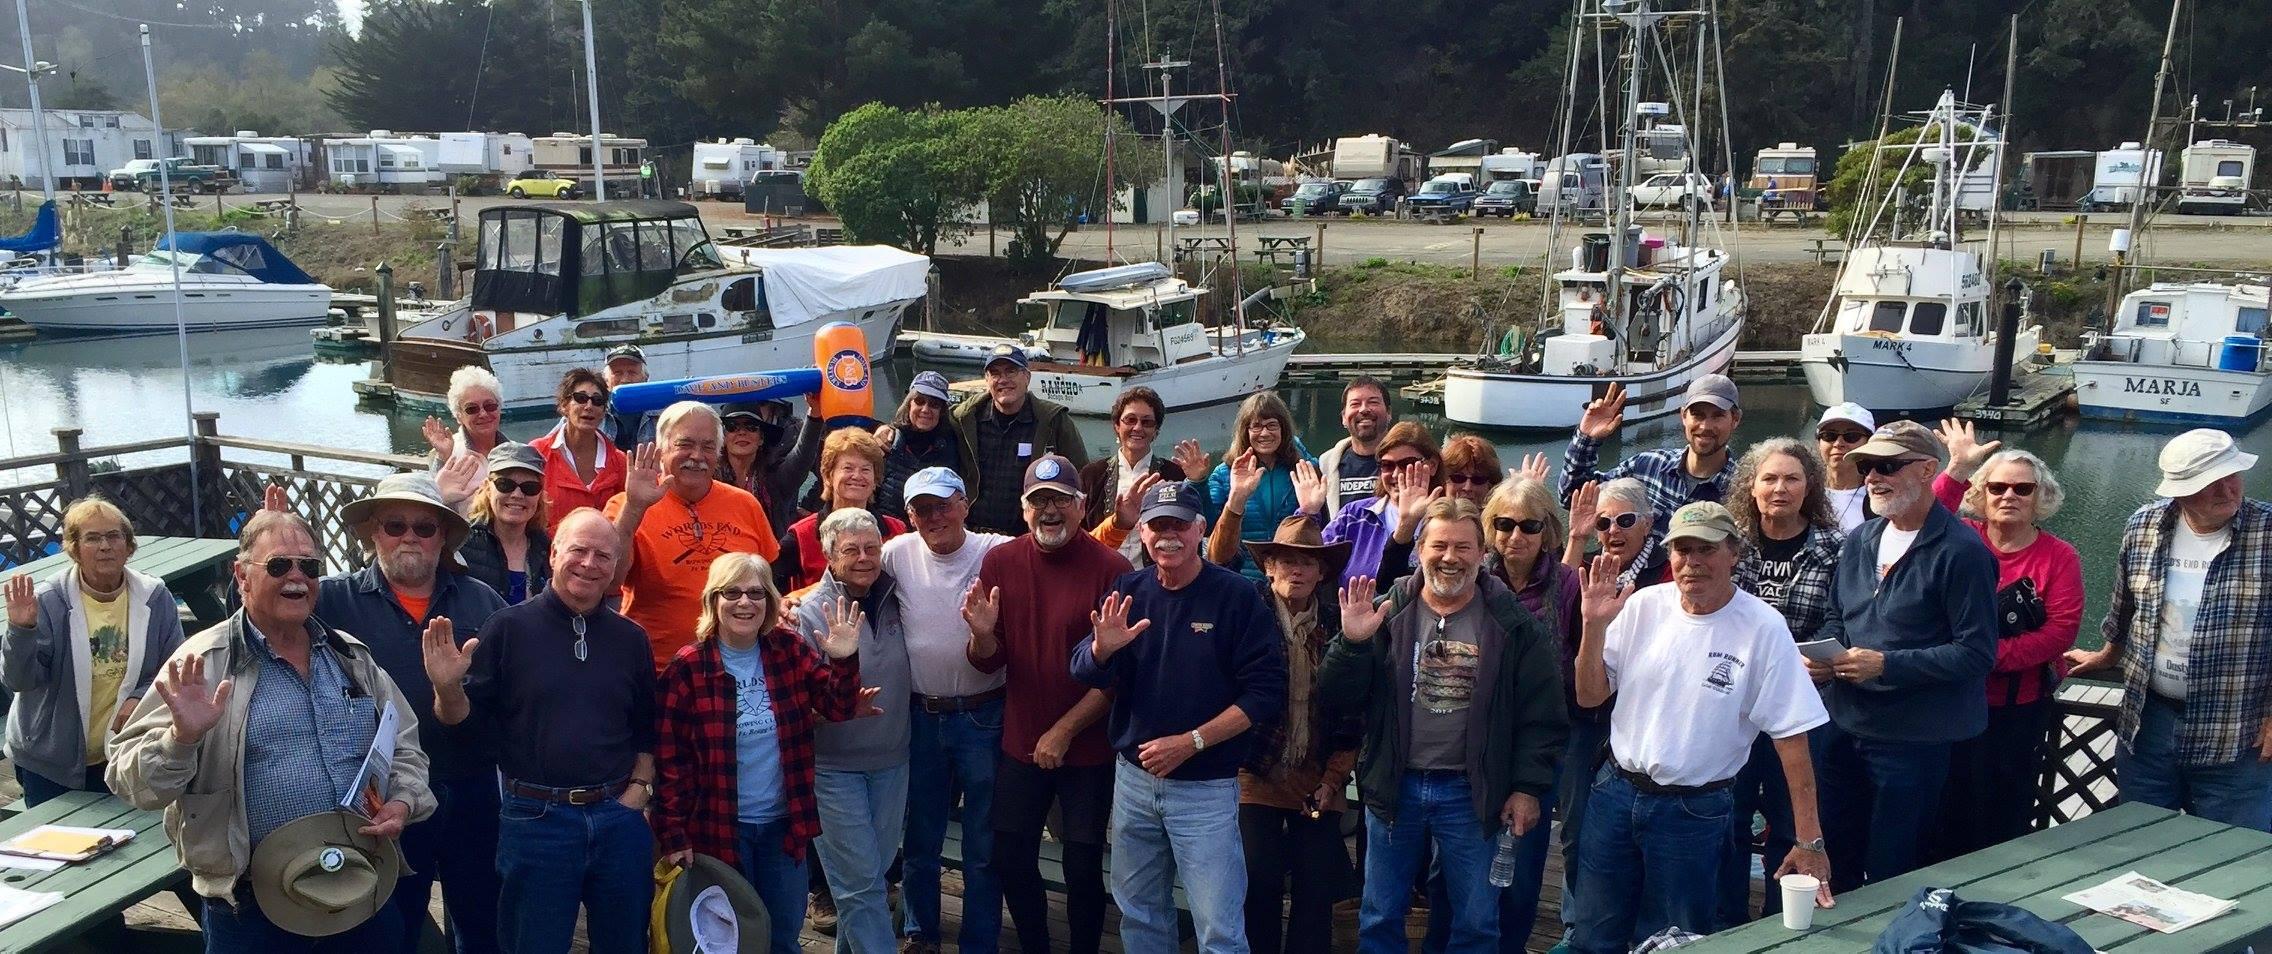 Lost Coast TSCA members